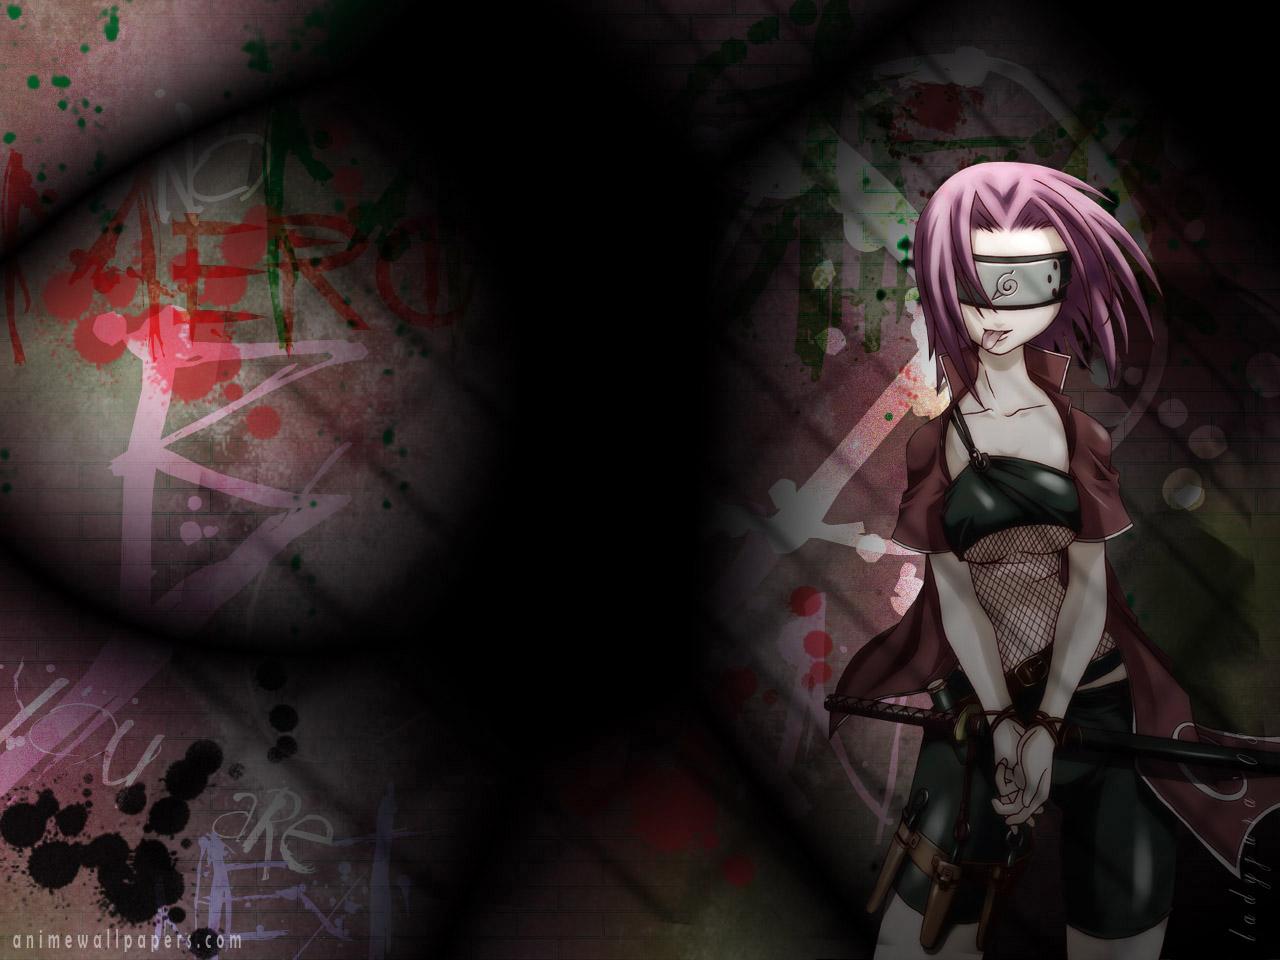 Naruto Anime Wallpaper # 211